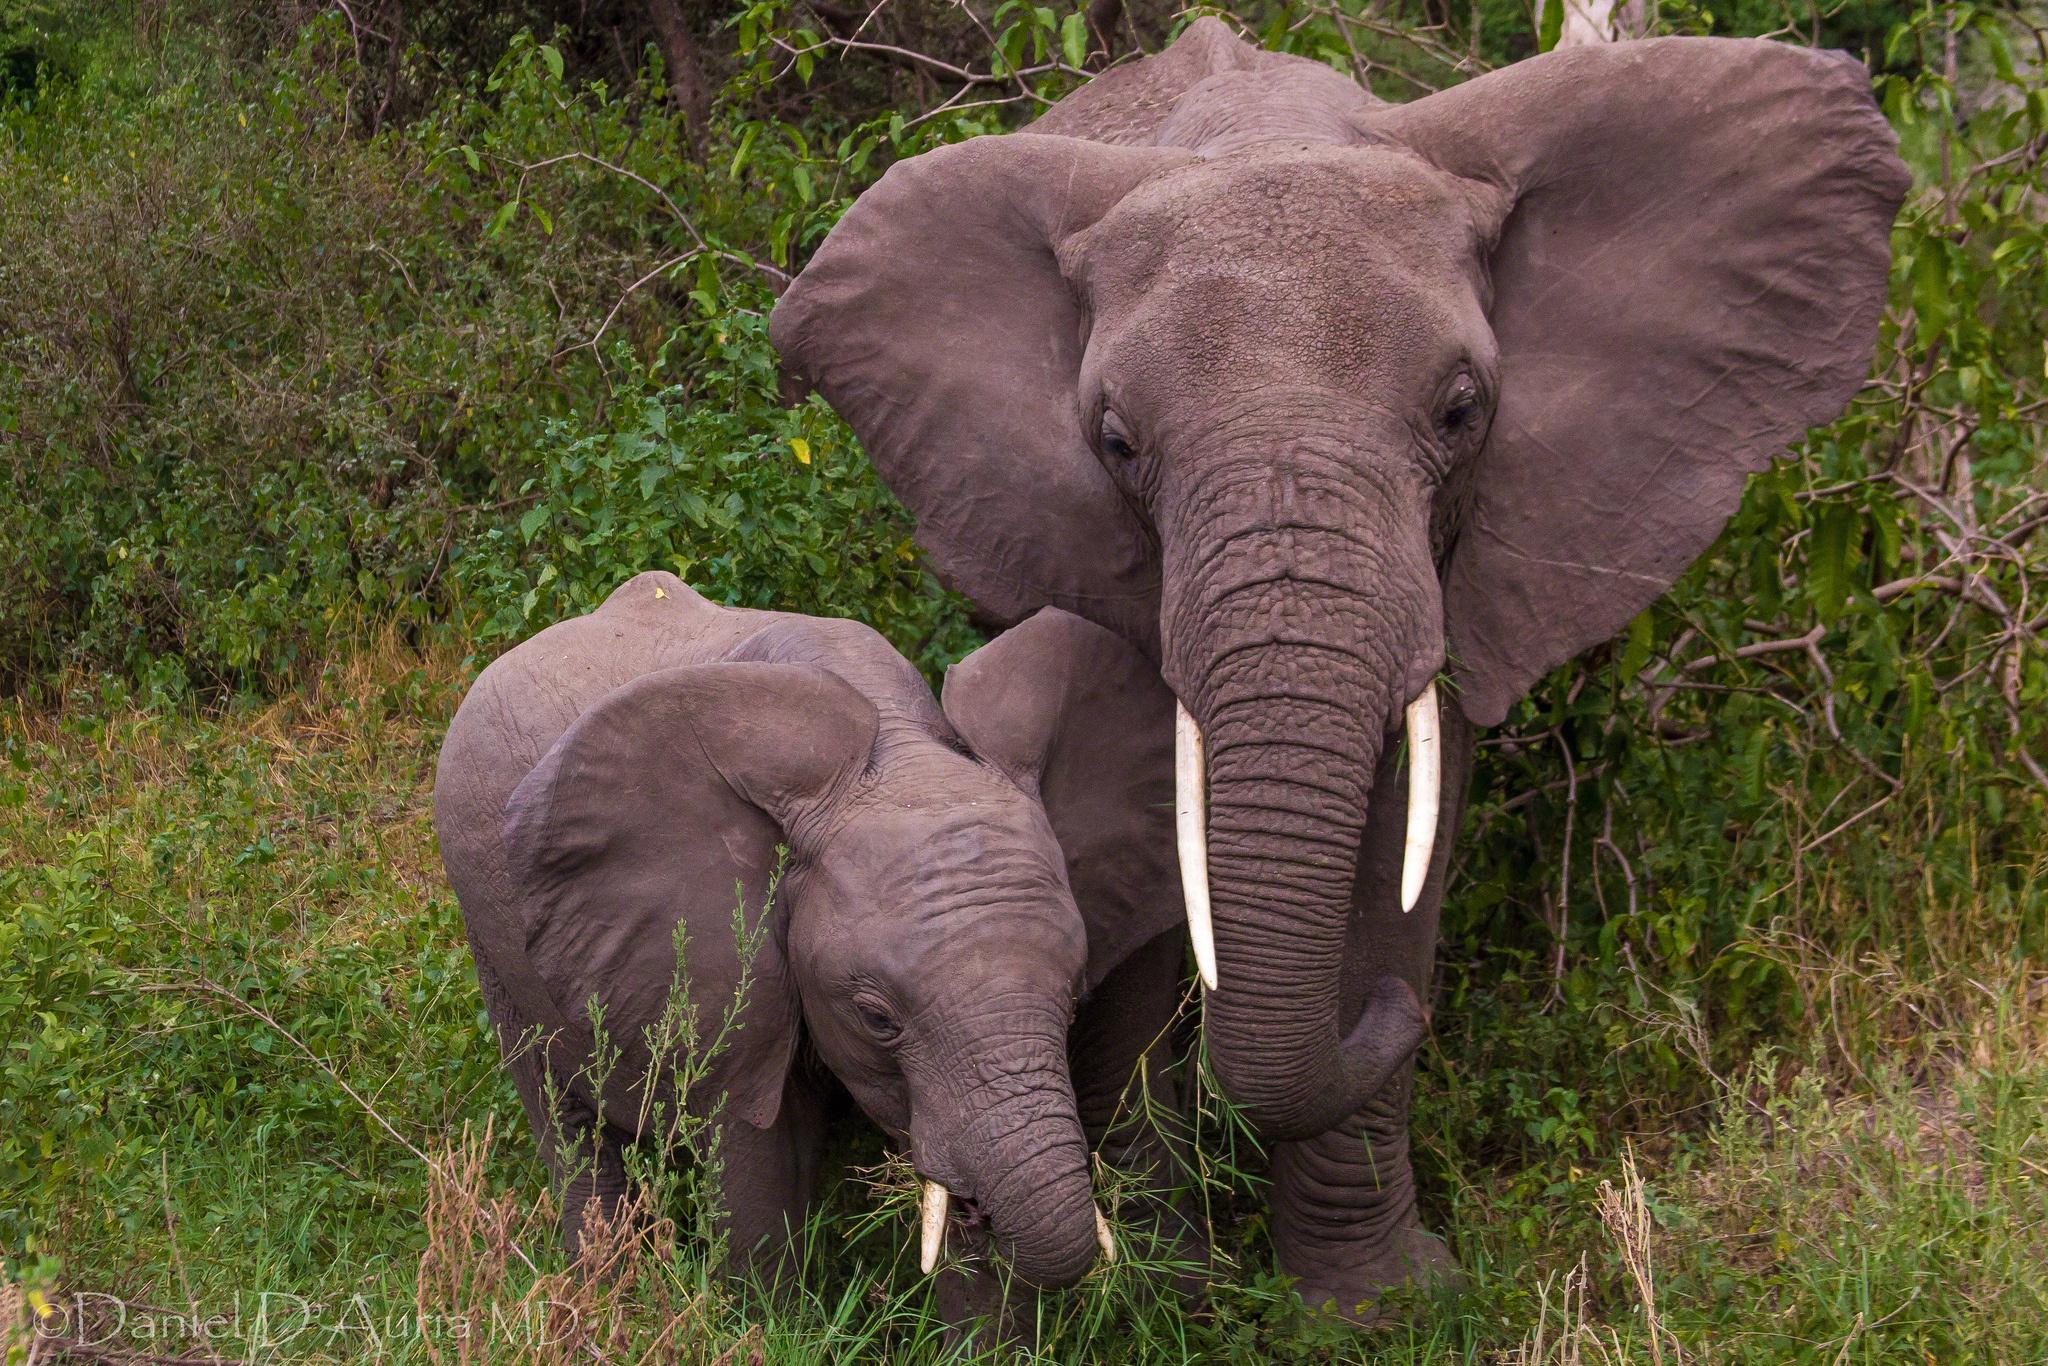 baby elephant wallpaper 2048x1366 166810 wallpaperup